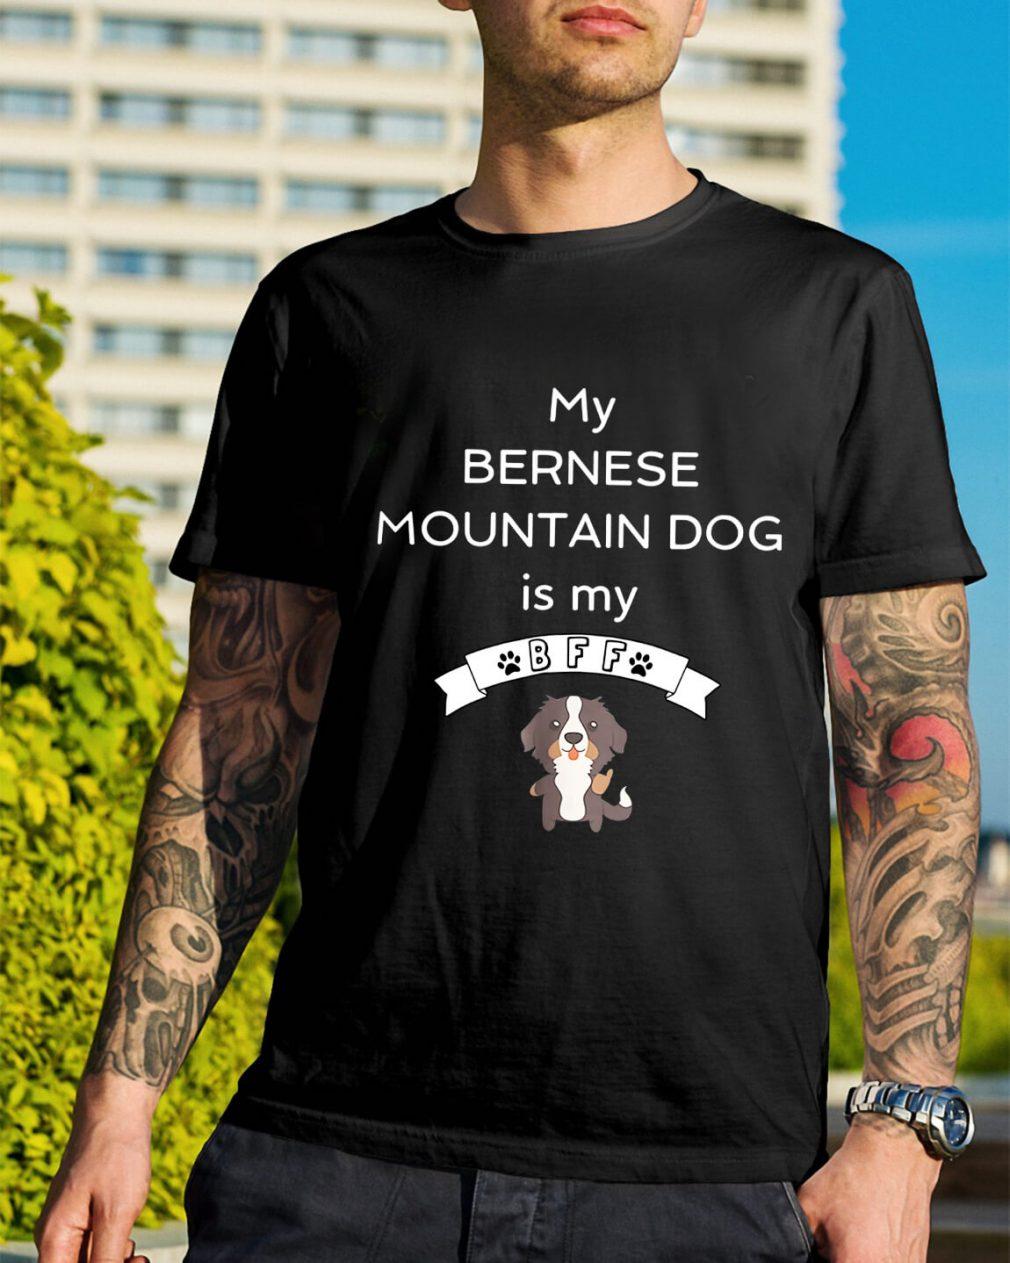 My Bernese mountain dog is my Bff shirt